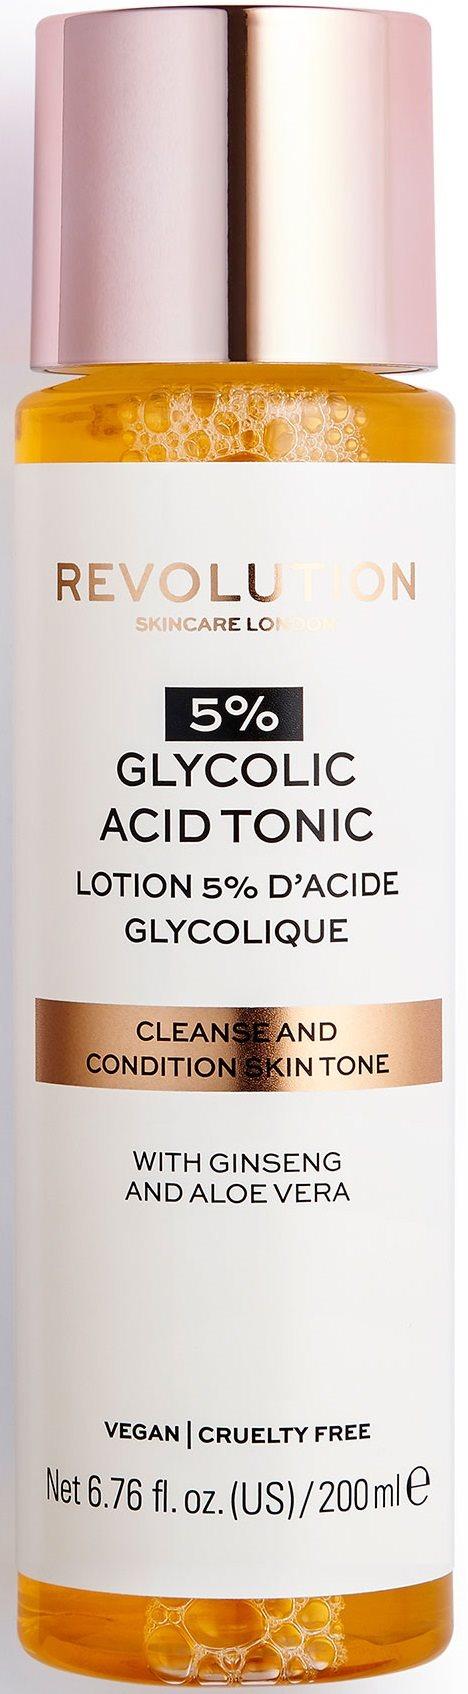 REVOLUTION SKINCARE 5% Glycolic Acid Tonic 200 ml